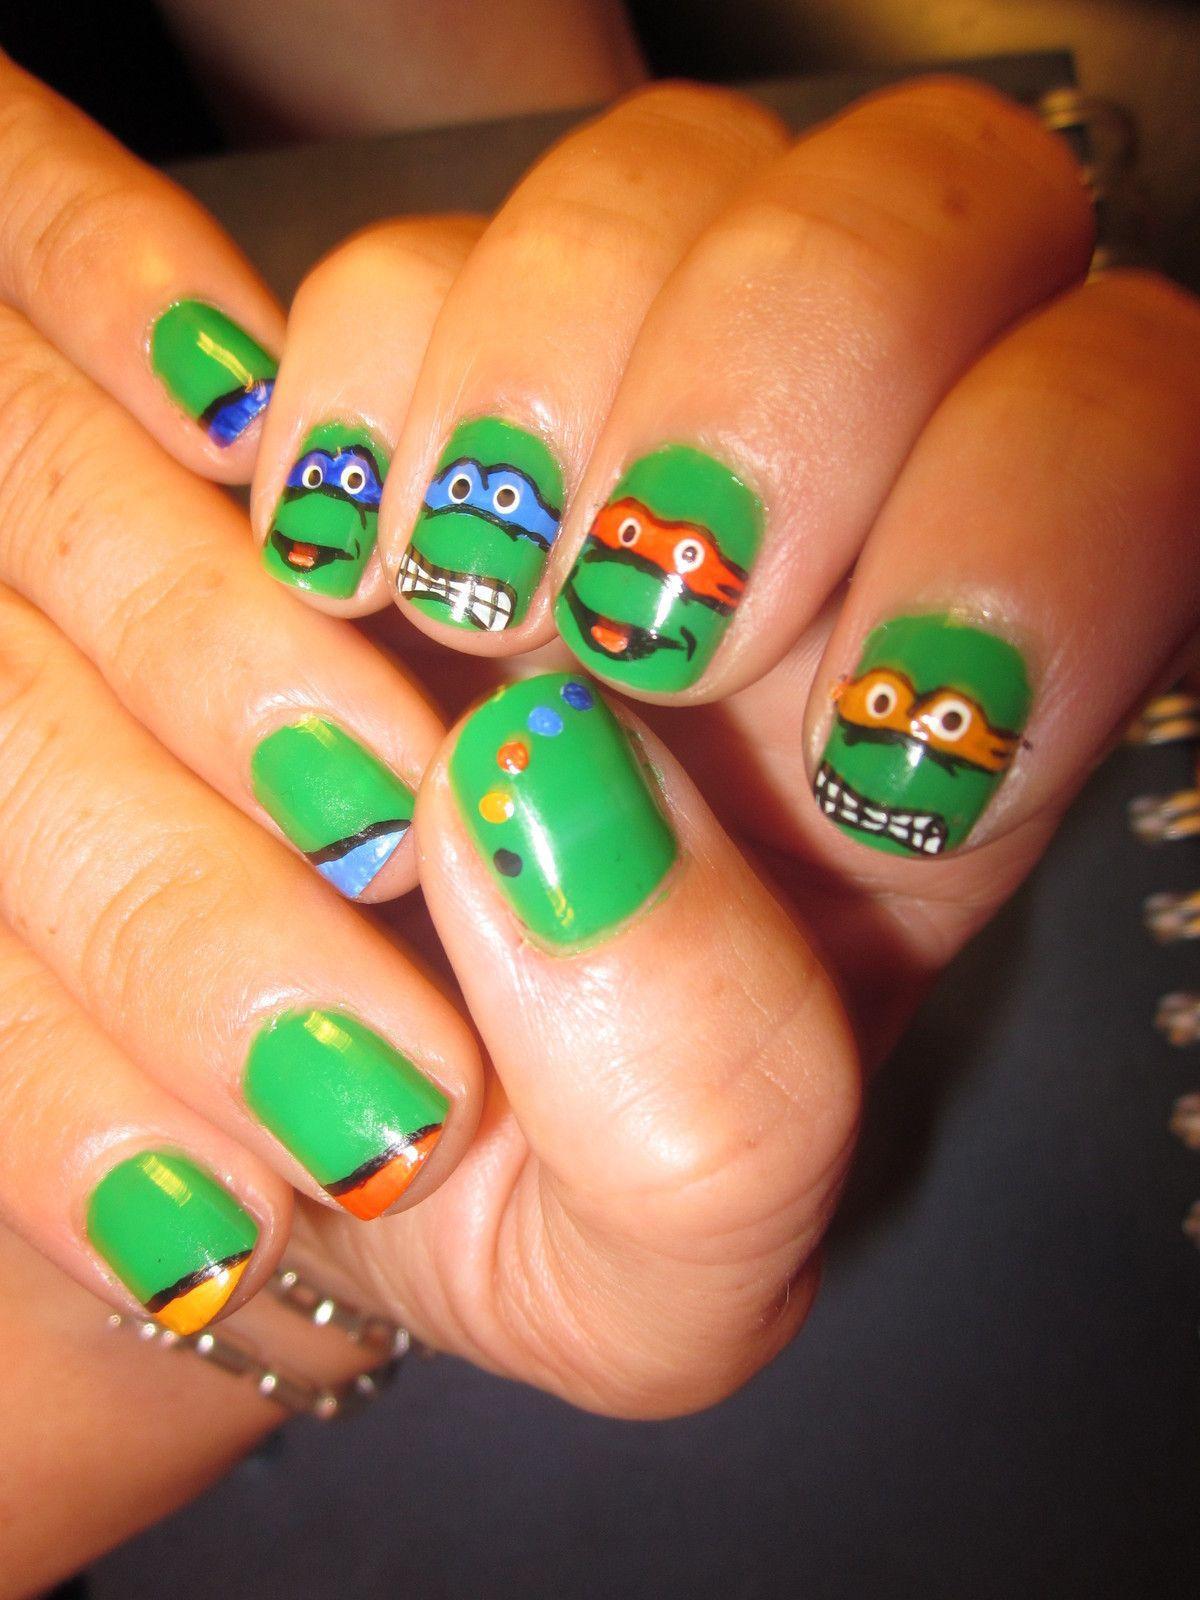 Ninja Turtles Nails   Ninja turtle nails, Turtle nails and Ninja turtles